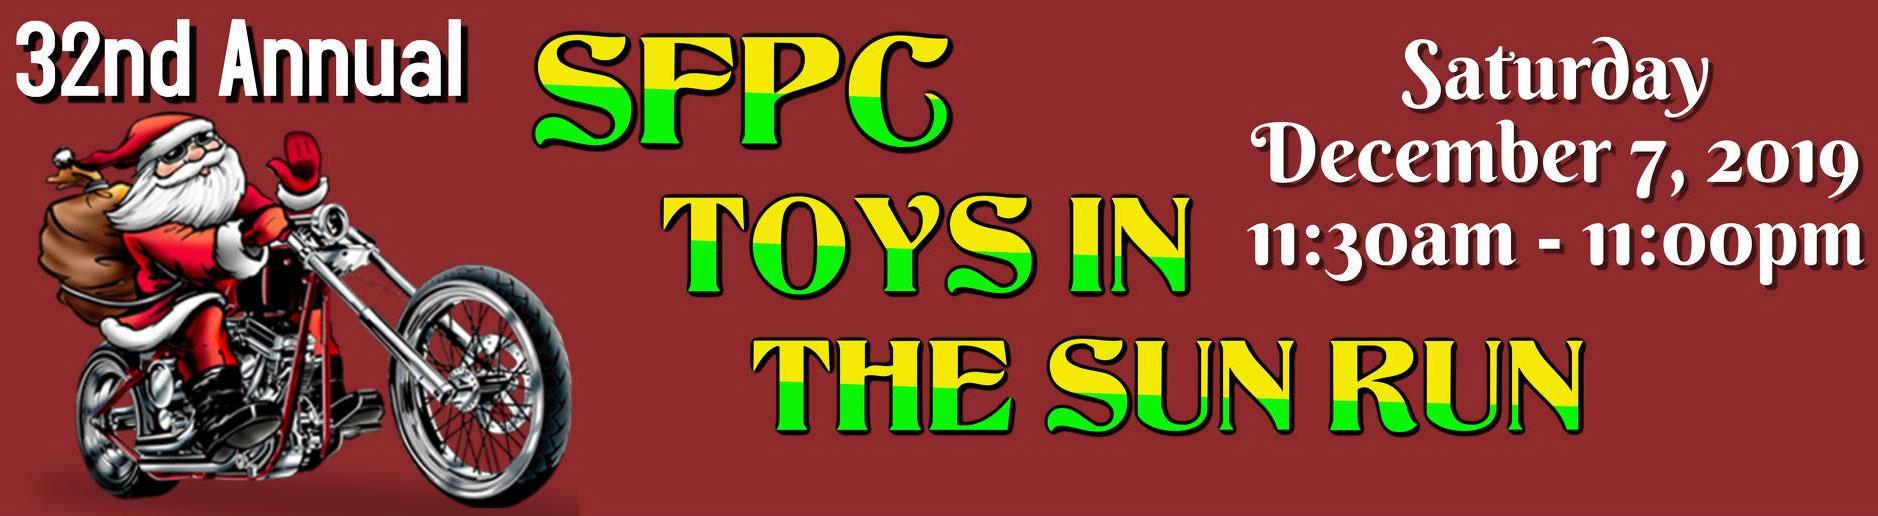 SFPC Toys in the Sun Run 32nd Annual  Pompano Beach,FL